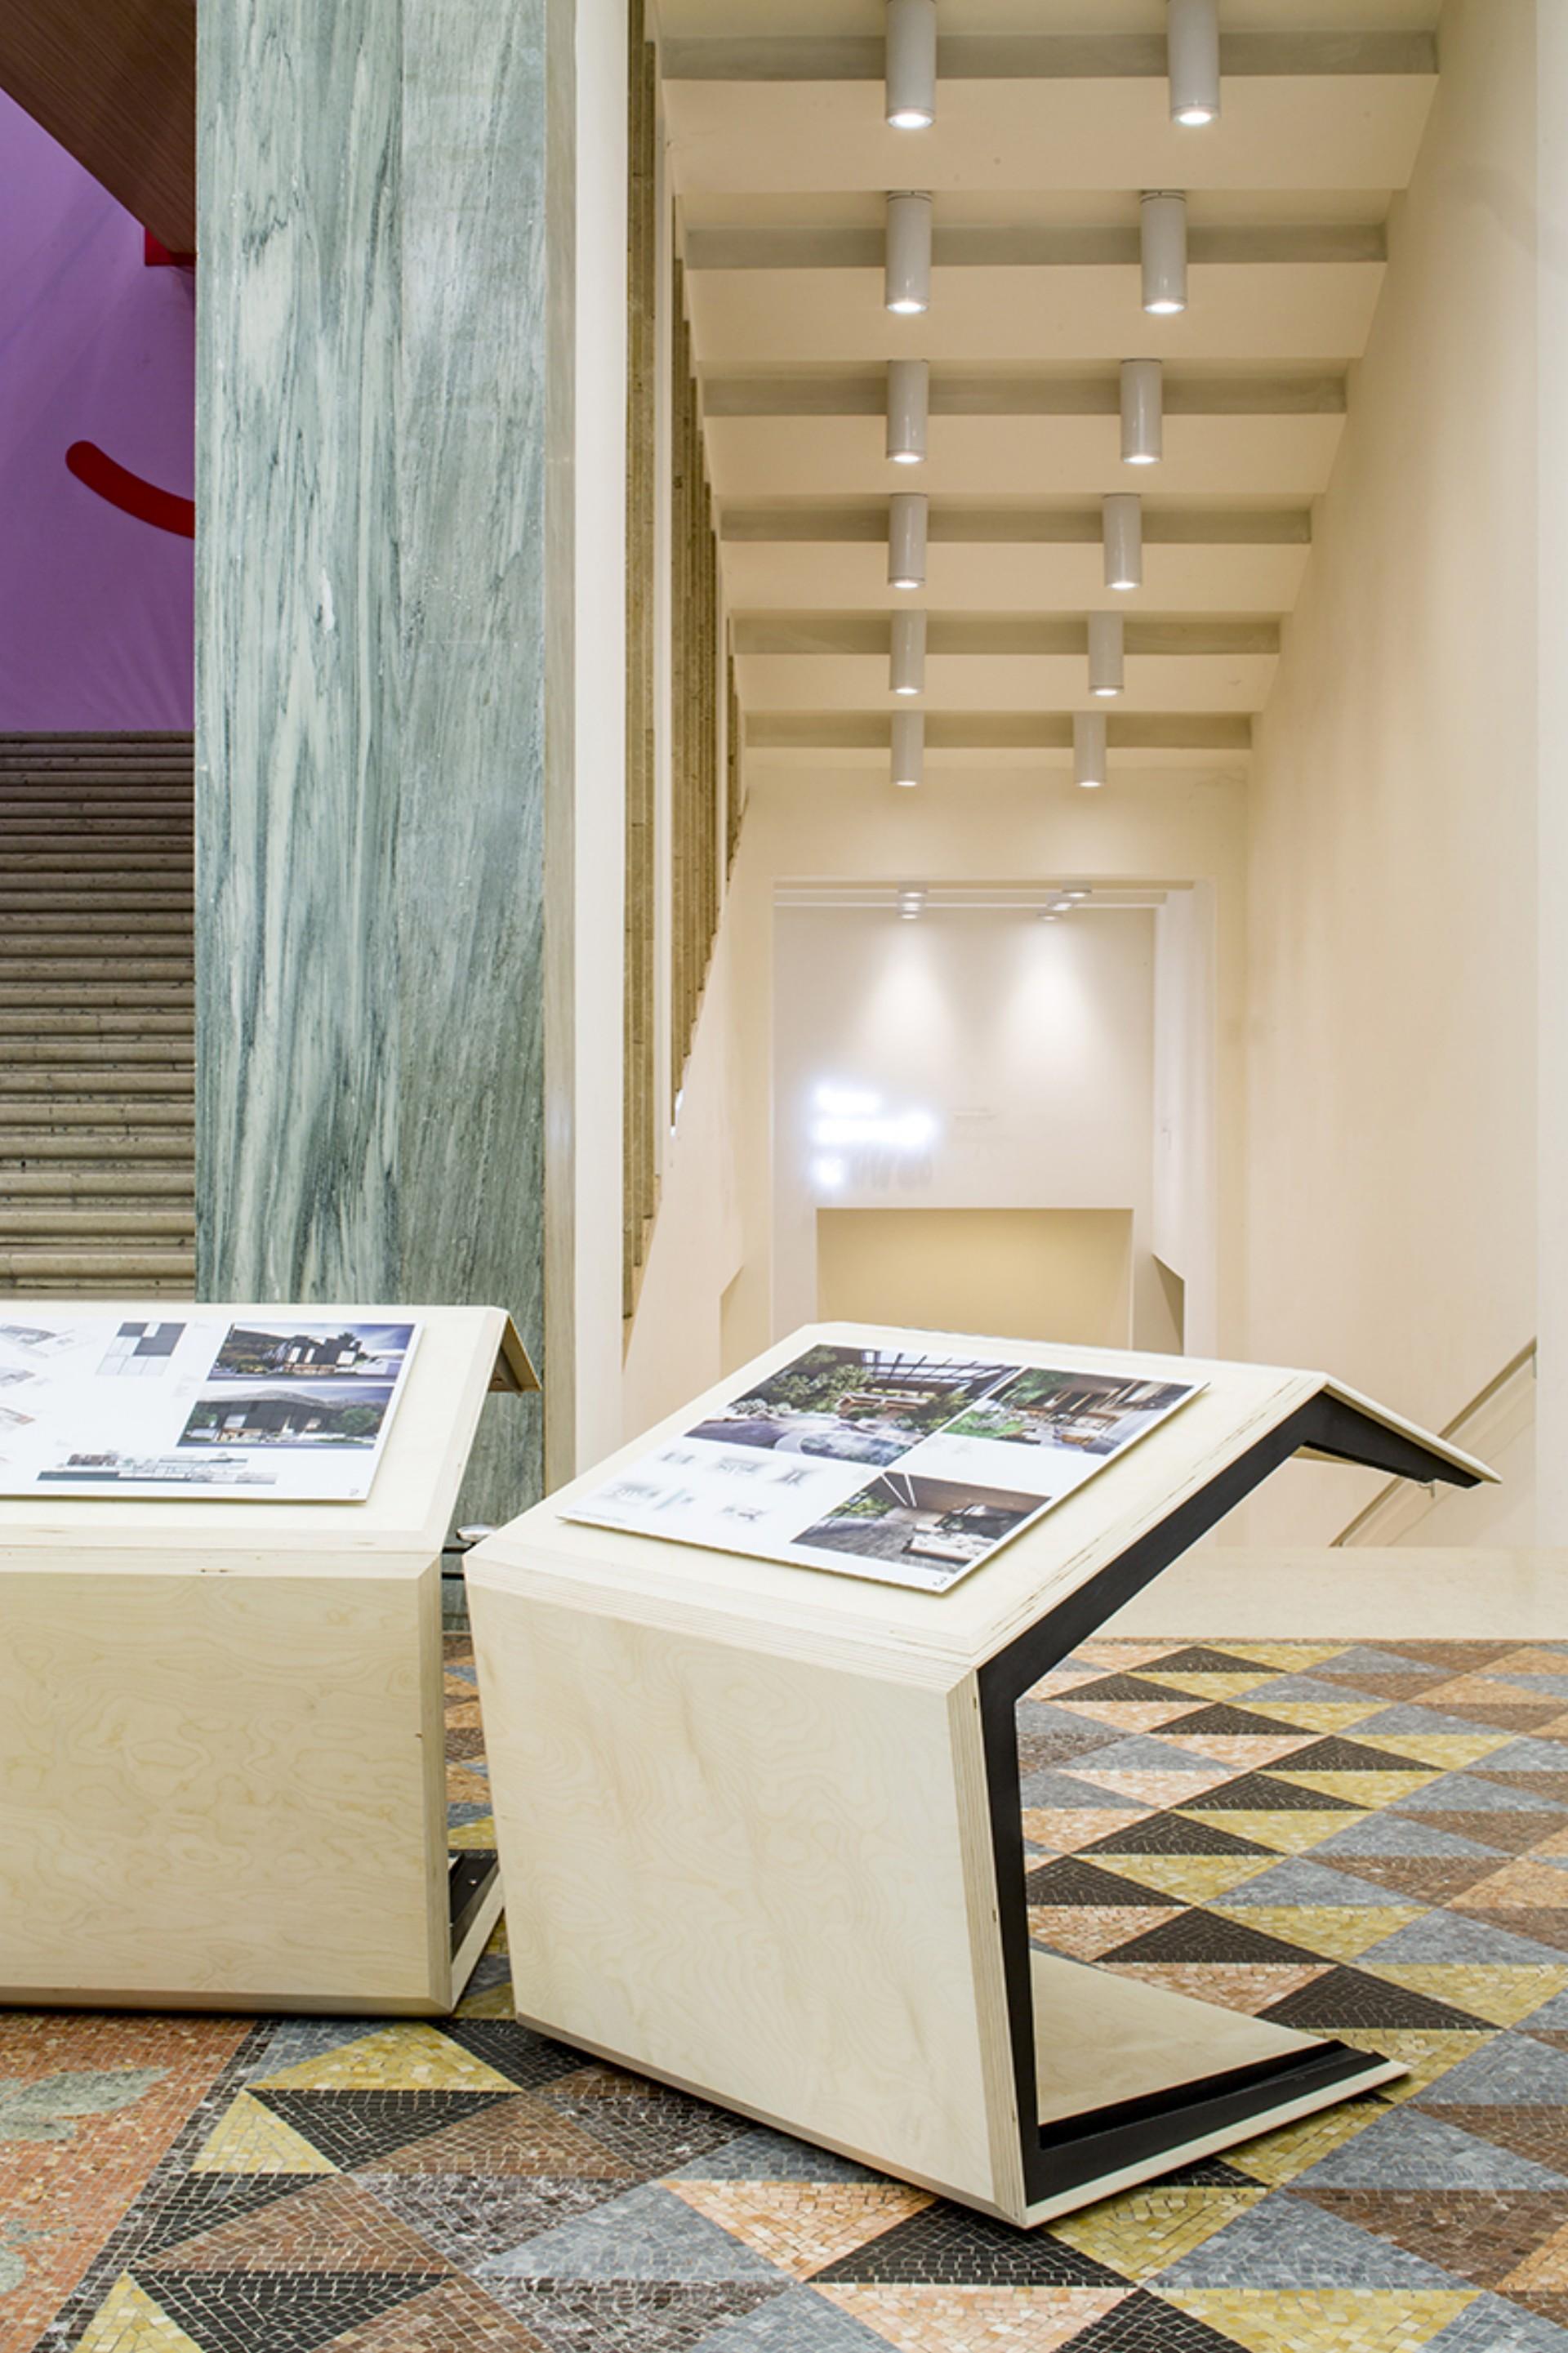 Agua luz bienestar arquitectura alpina contemporanea - Eau arquitectura ...